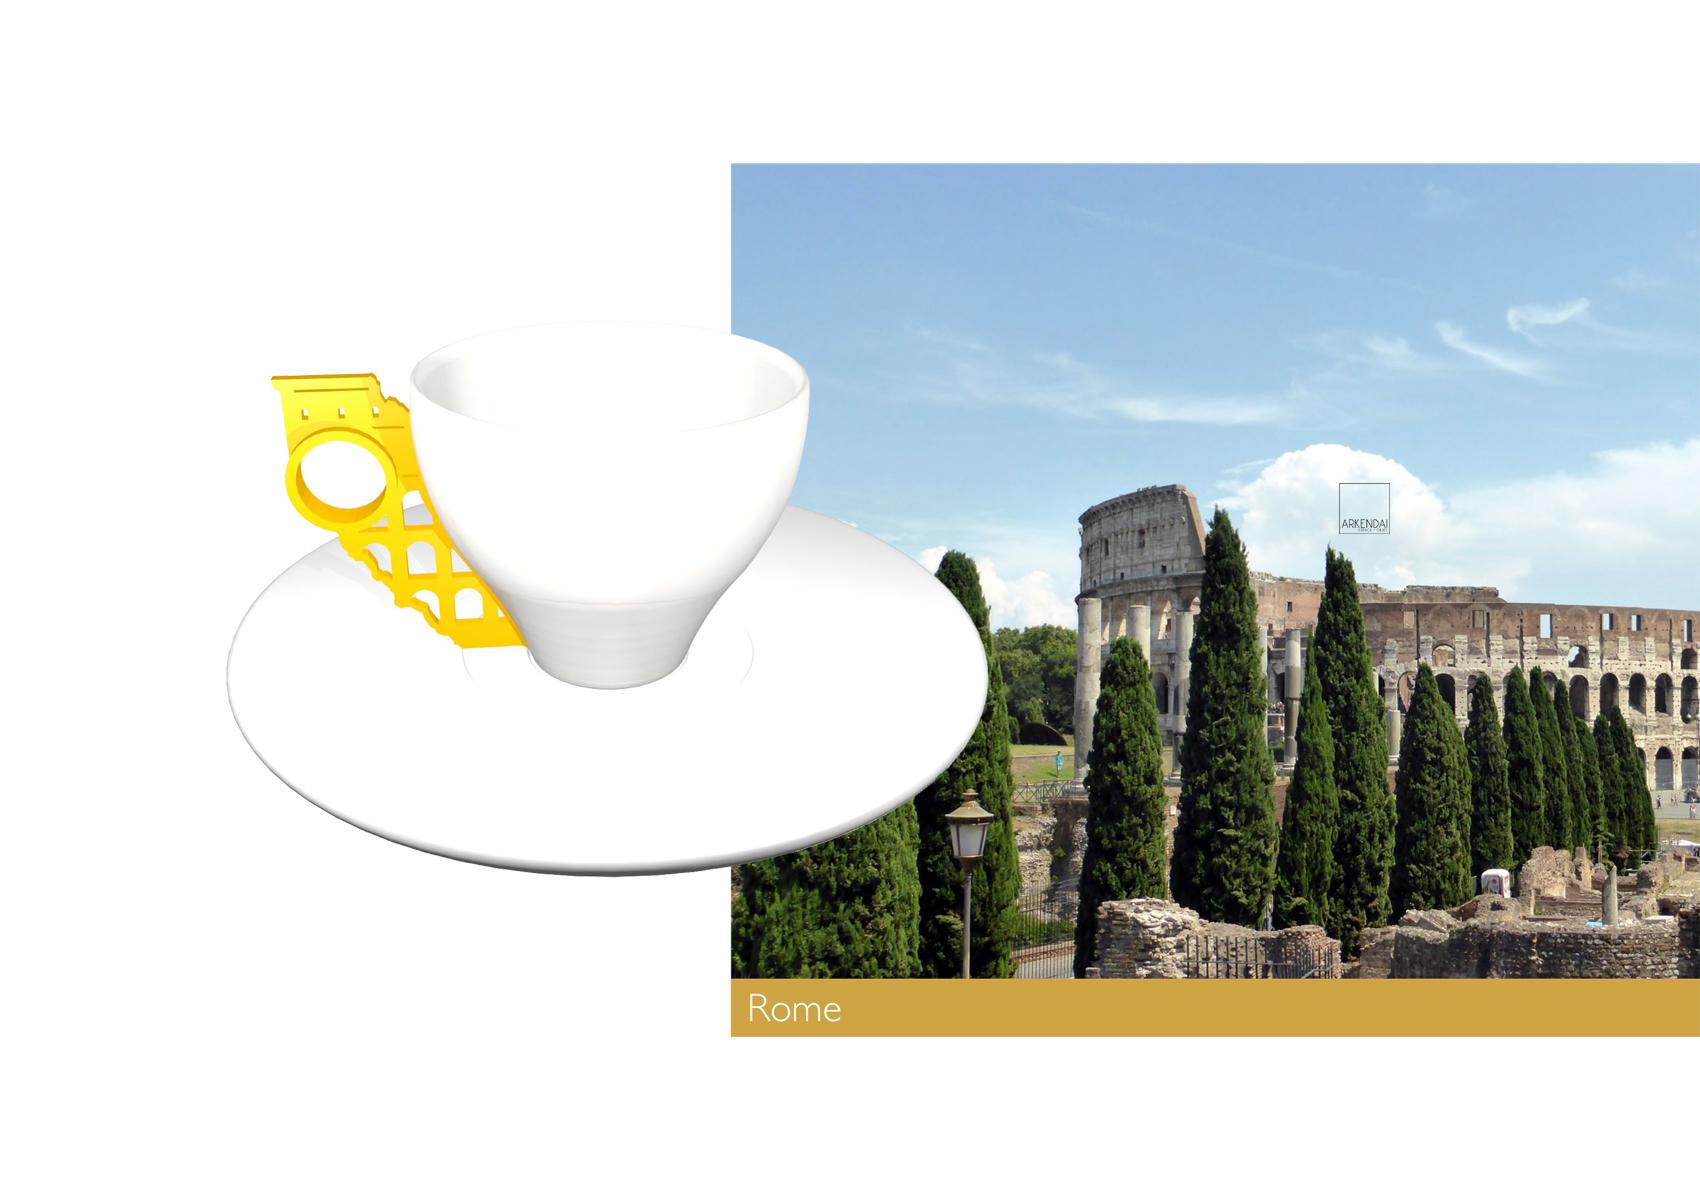 arkendai-tasse-1700-rome